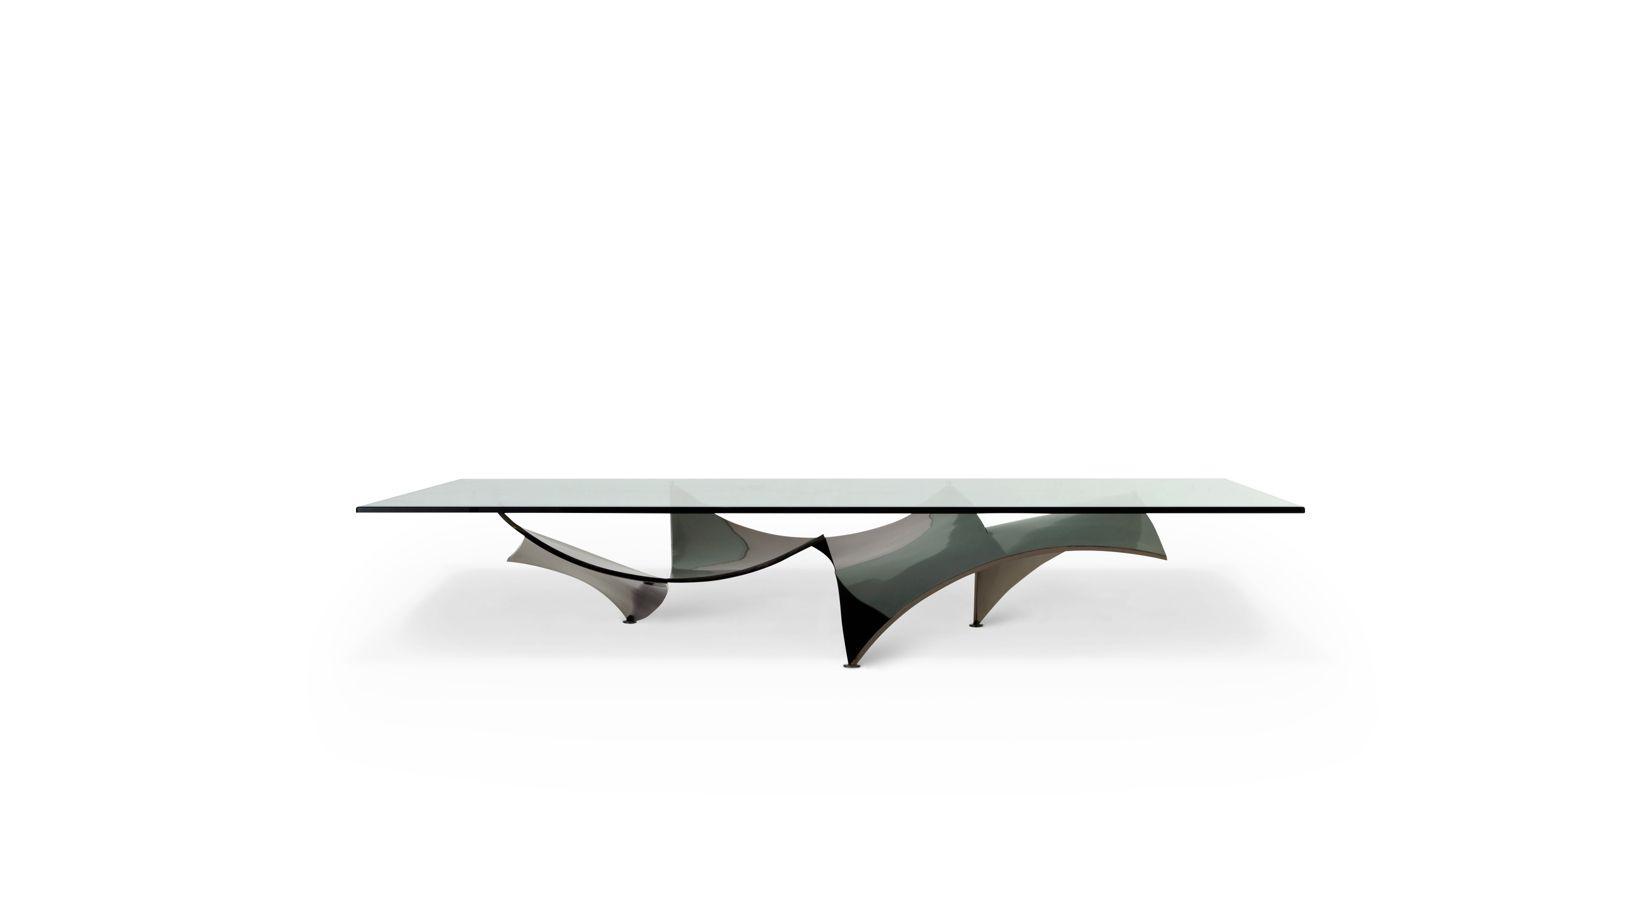 Voiles dining table roche bobois for Table basse verre roche bobois